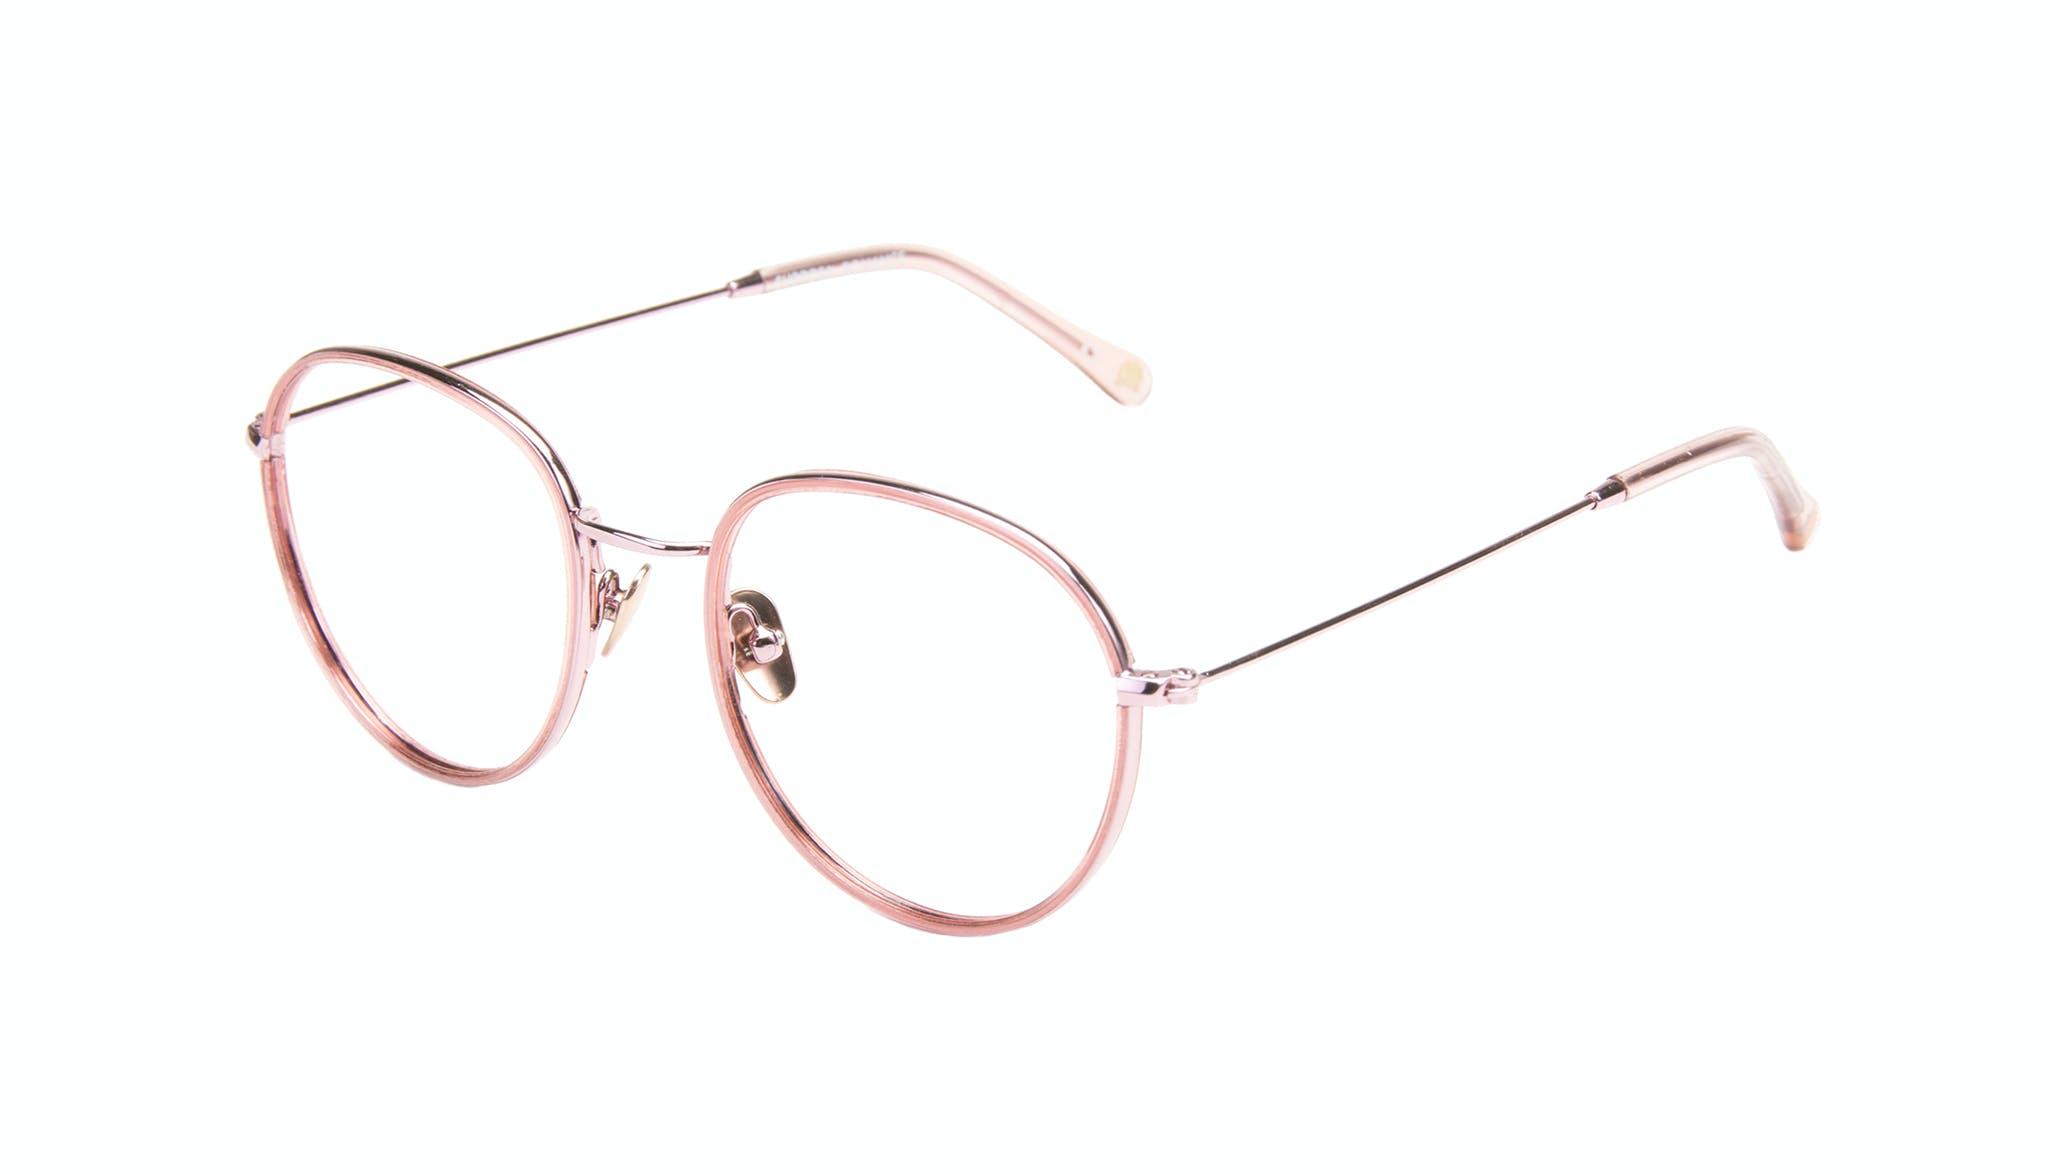 Affordable Fashion Glasses Aviator Round Eyeglasses Women Subrosa Romance Tilt